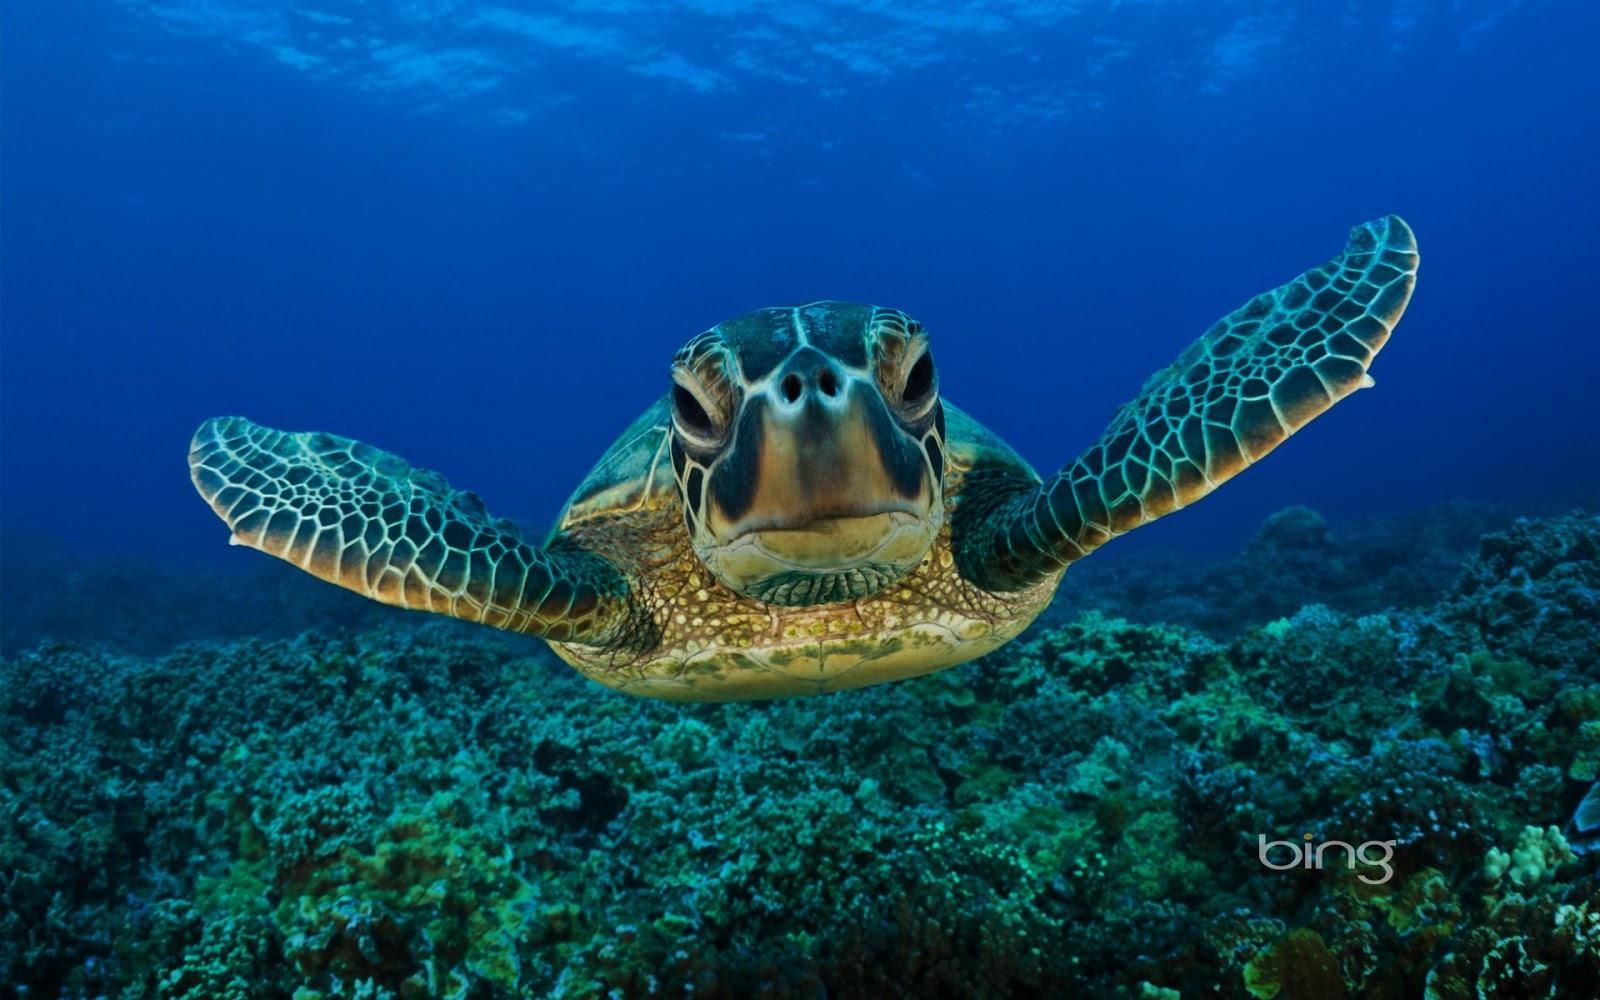 http://stilllearningsomethingnew.com/tag/world-turtle-day/